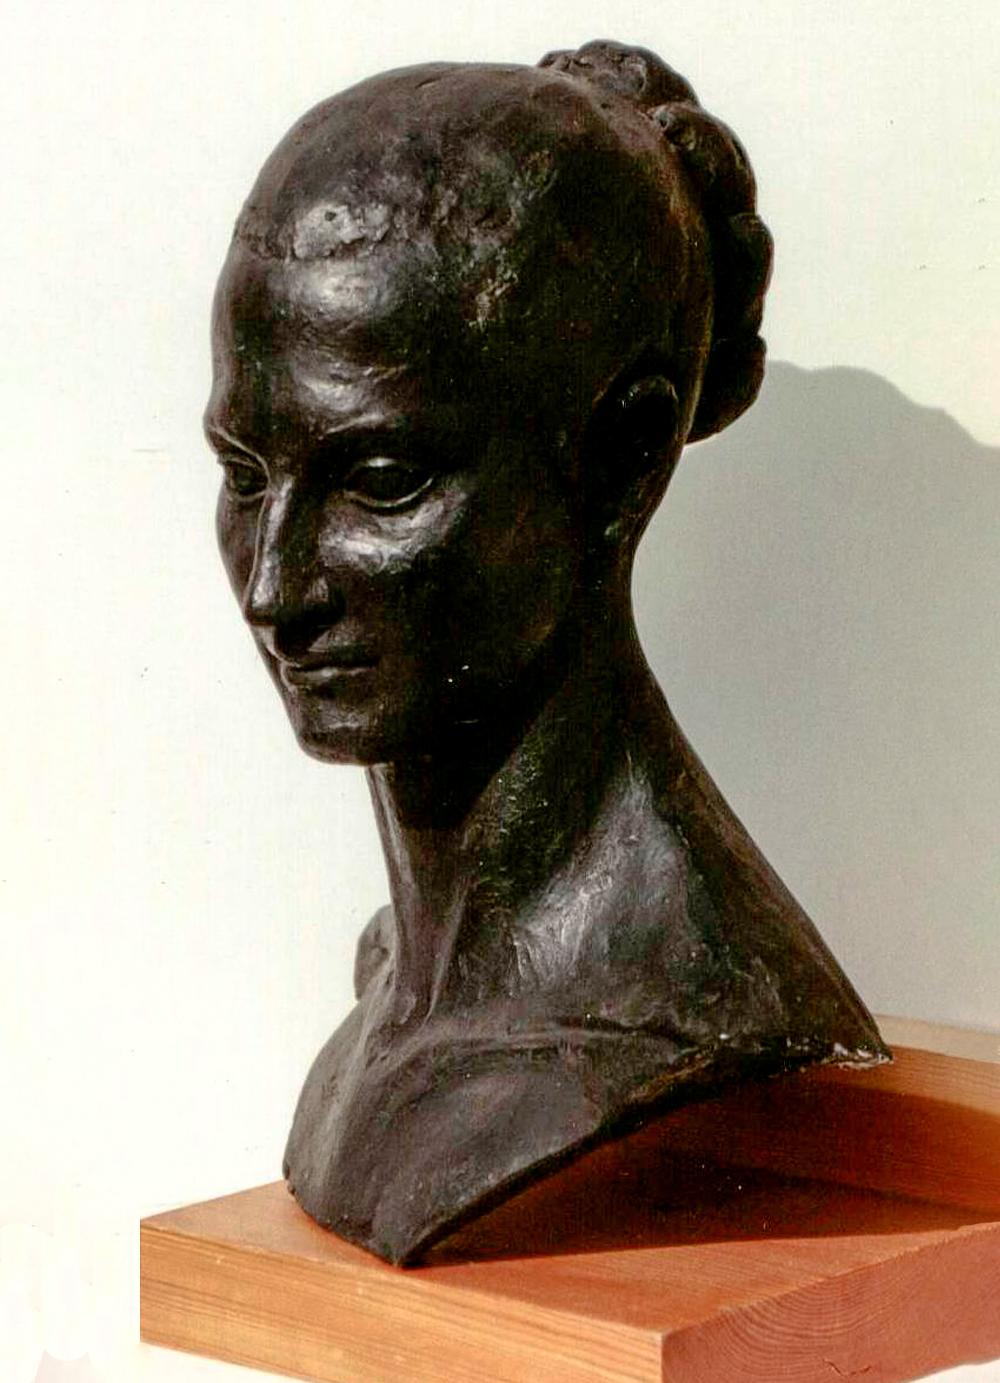 Escultura-Retrato-de-Montse-Figurativo-Abstracto-RD.Escultor